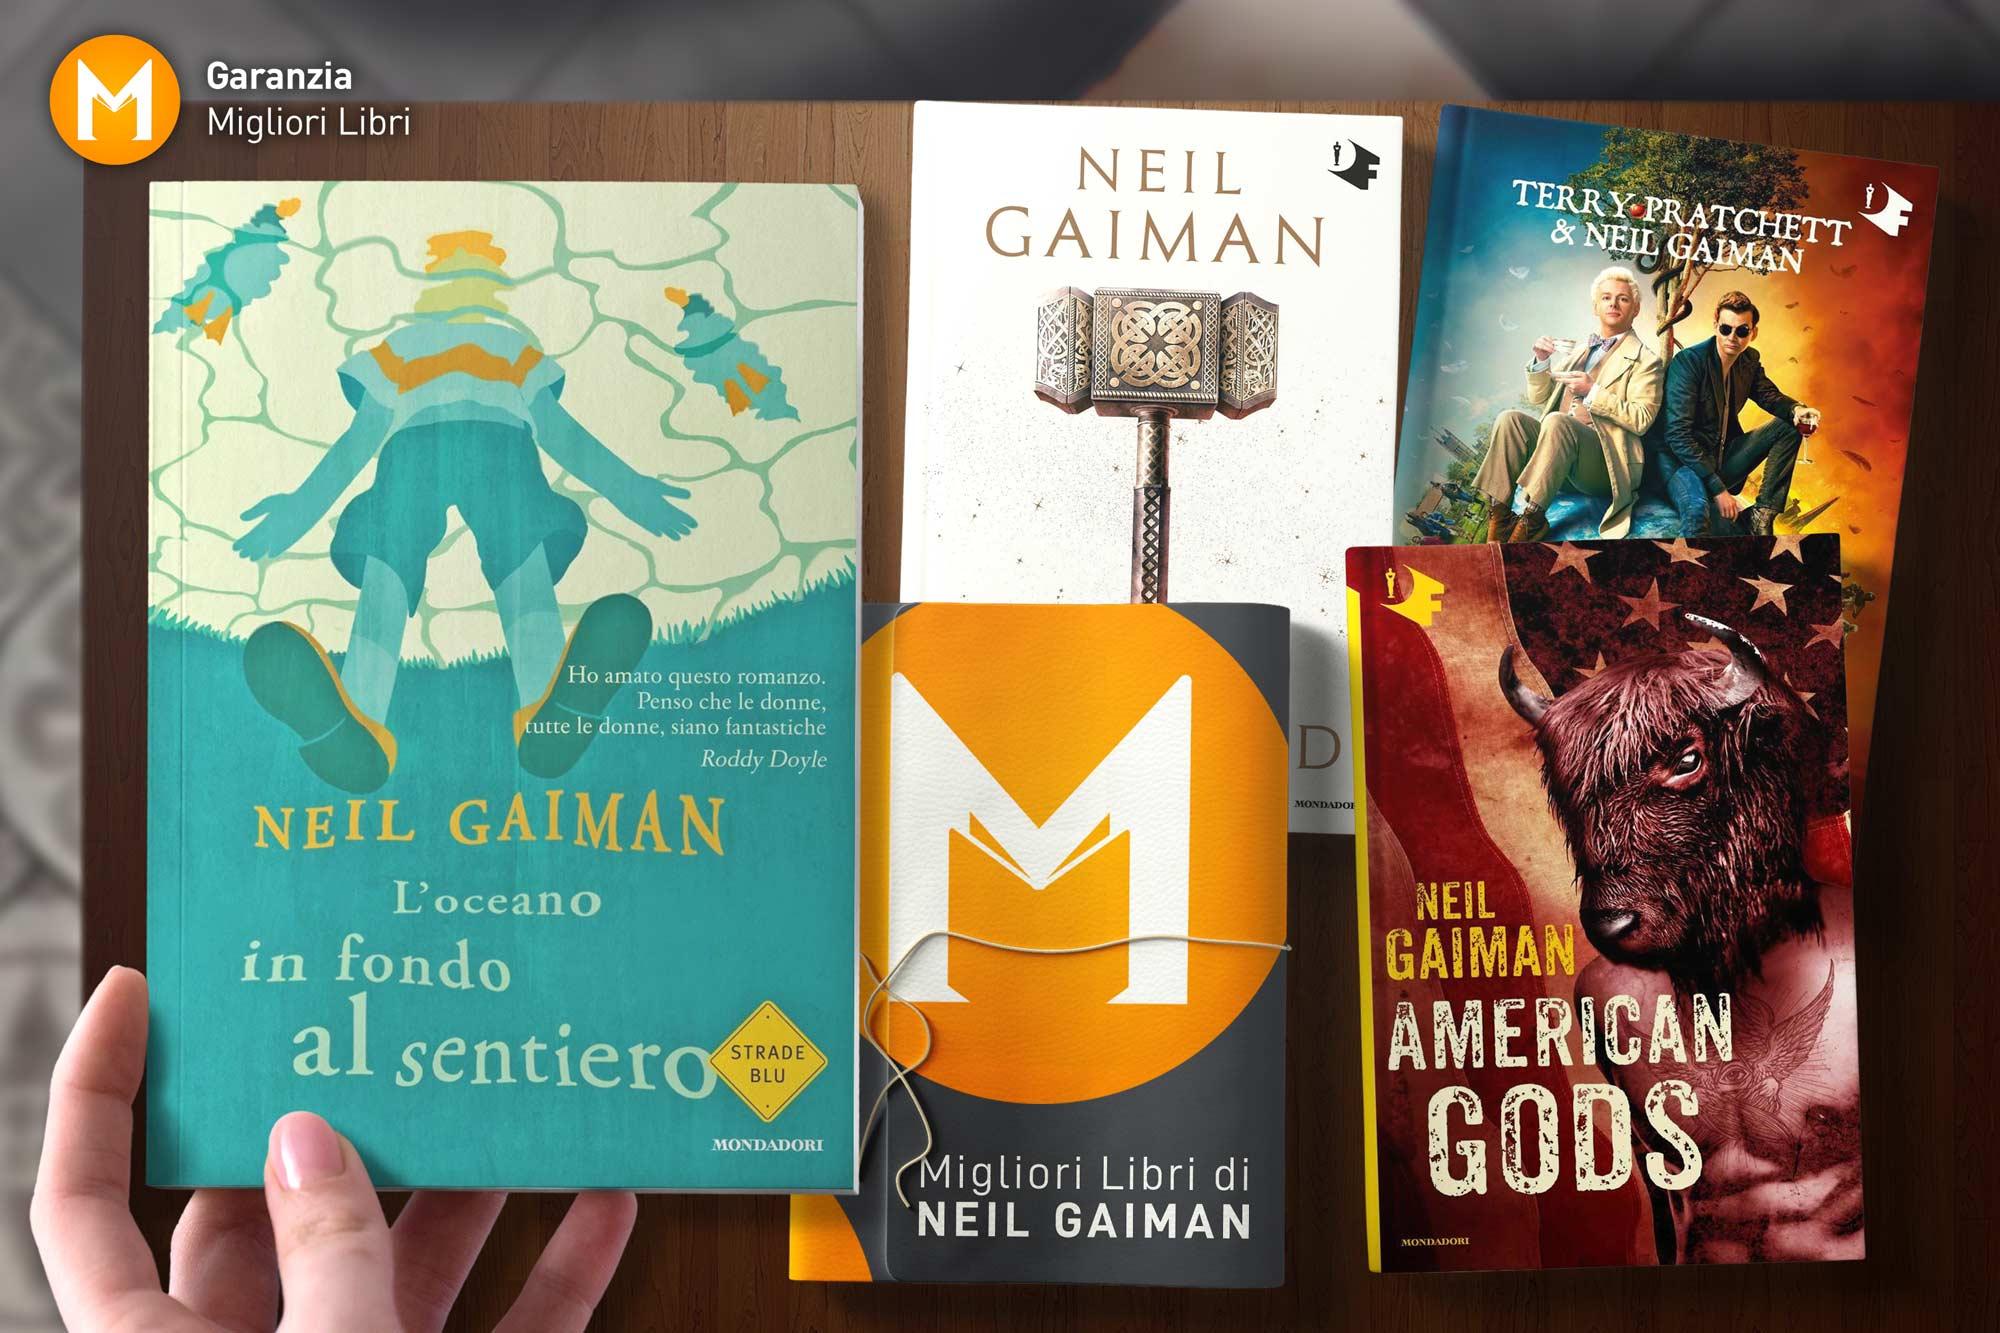 migliori-libri-Neil-Gaiman-da-leggere